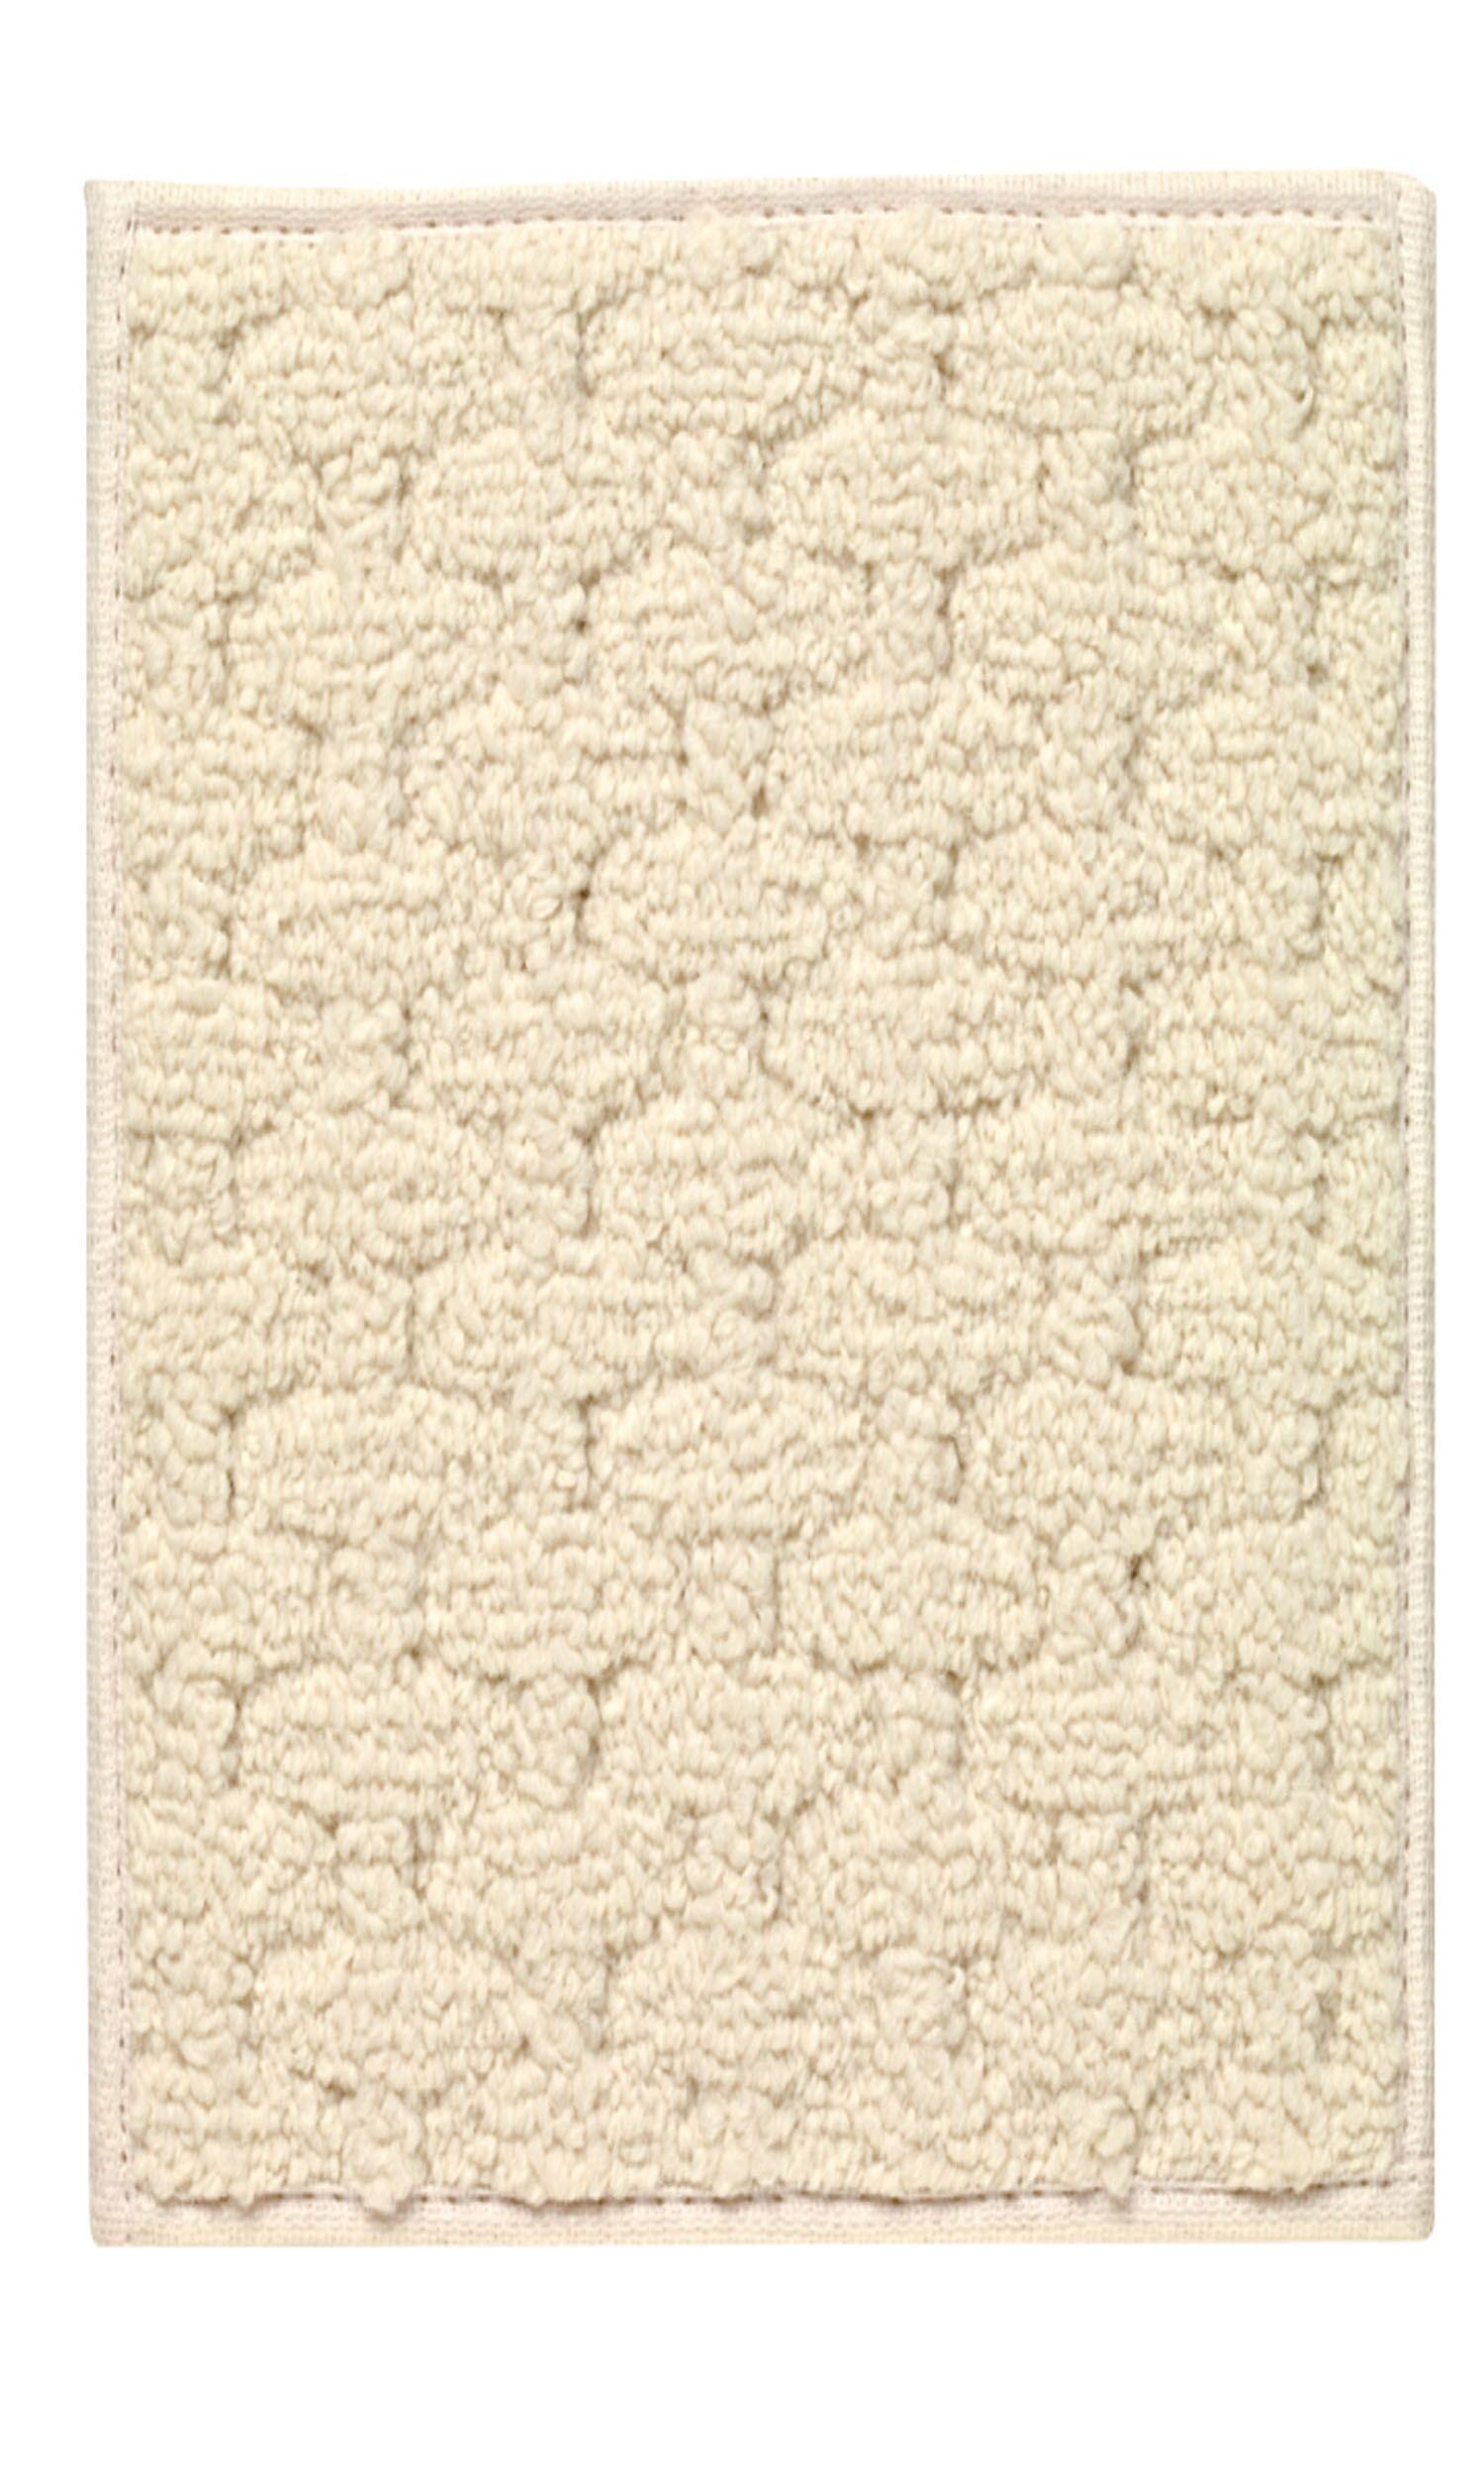 Shoal Sugar Mountain Machine Woven Indoor/Outdoor Area Rug Rug Size: Rectangle 10' x 14'